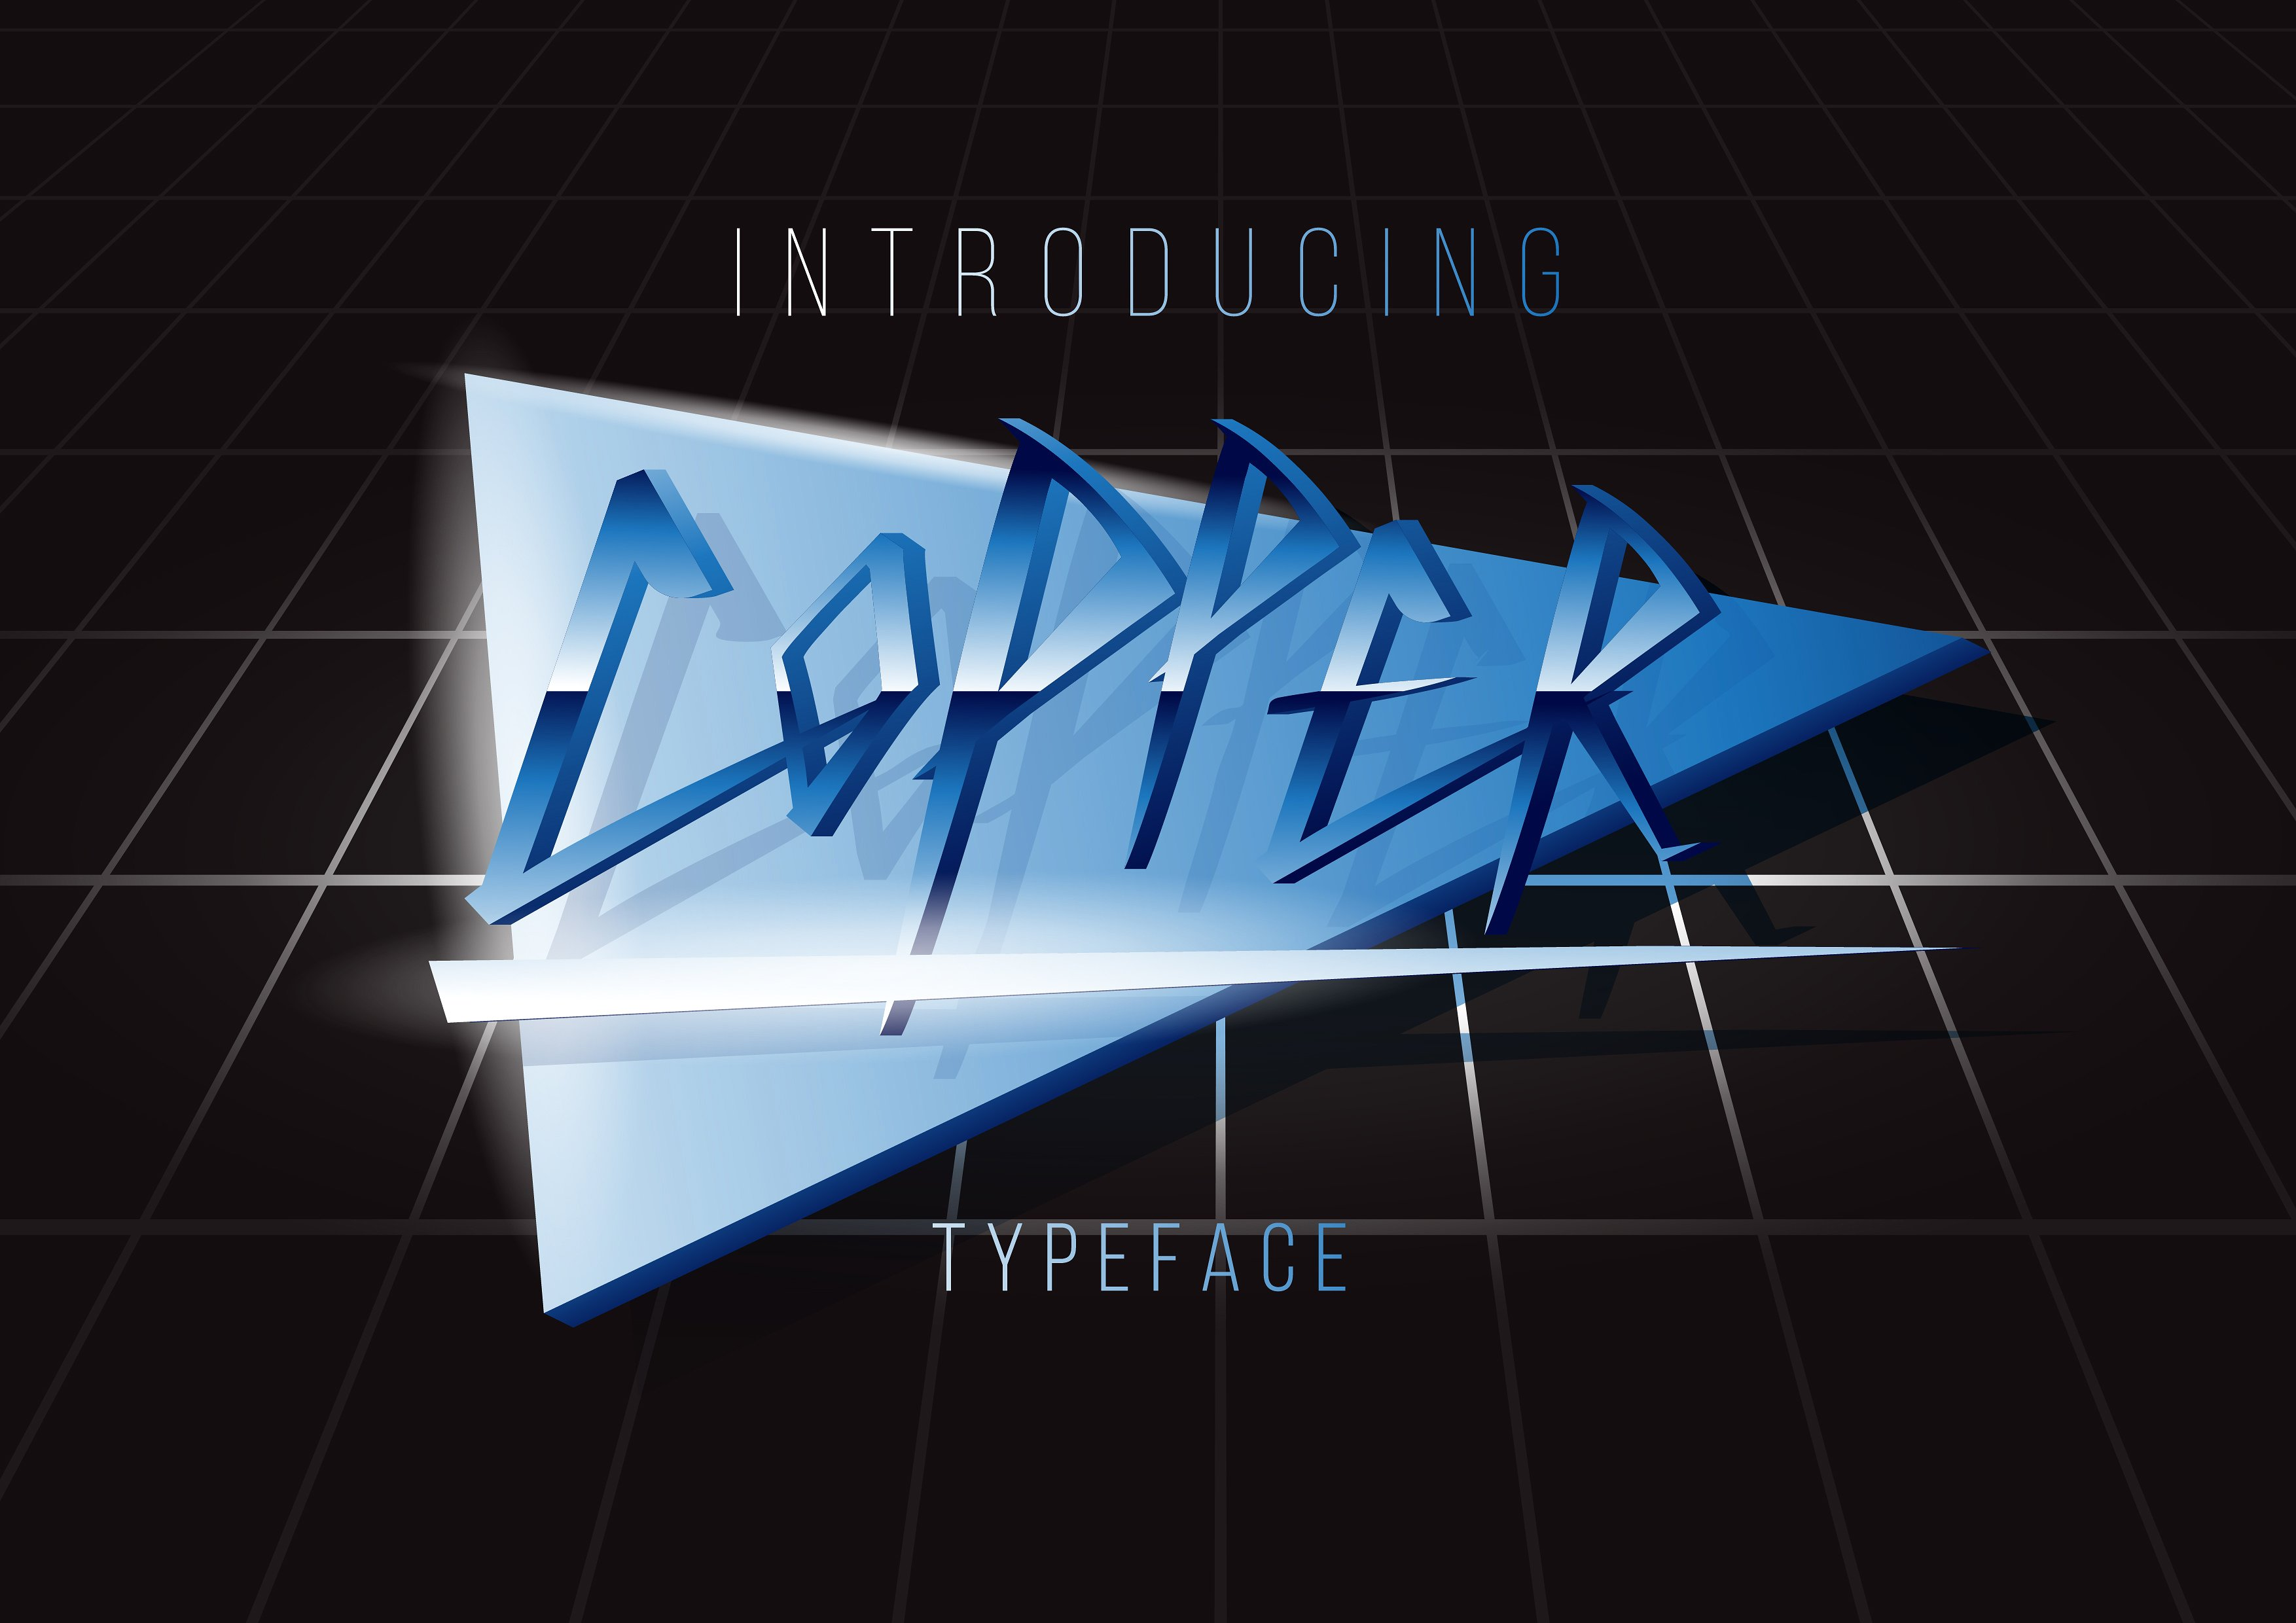 17 Inspiring 80's / 90's Fonts for Your Next Retro Design